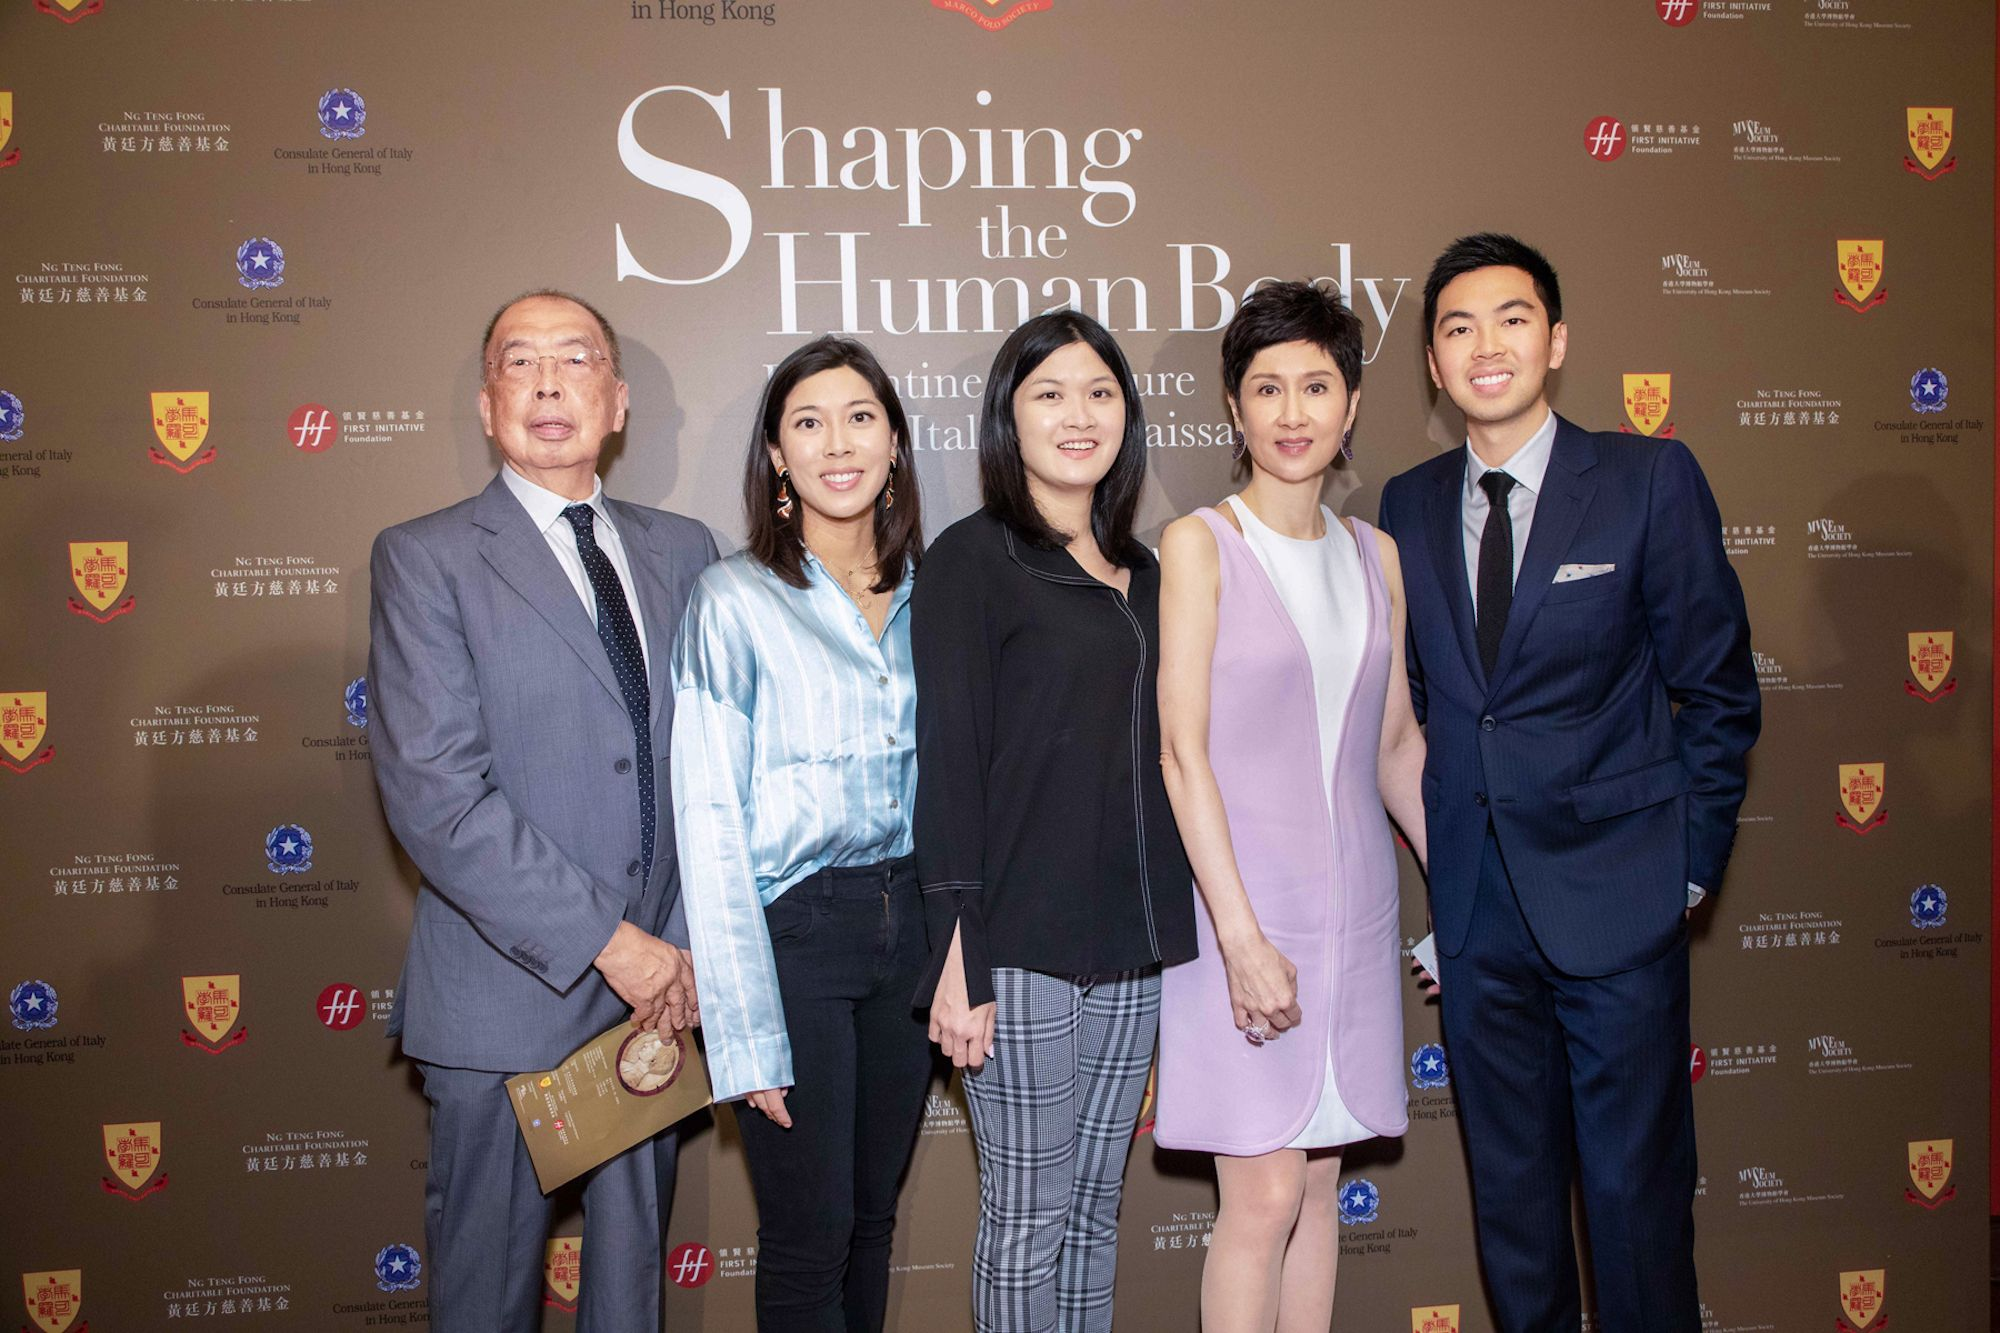 David Cheung, Amanda Cheung, Jennifer Cheung, Michelle Ong, Adrian Cheung